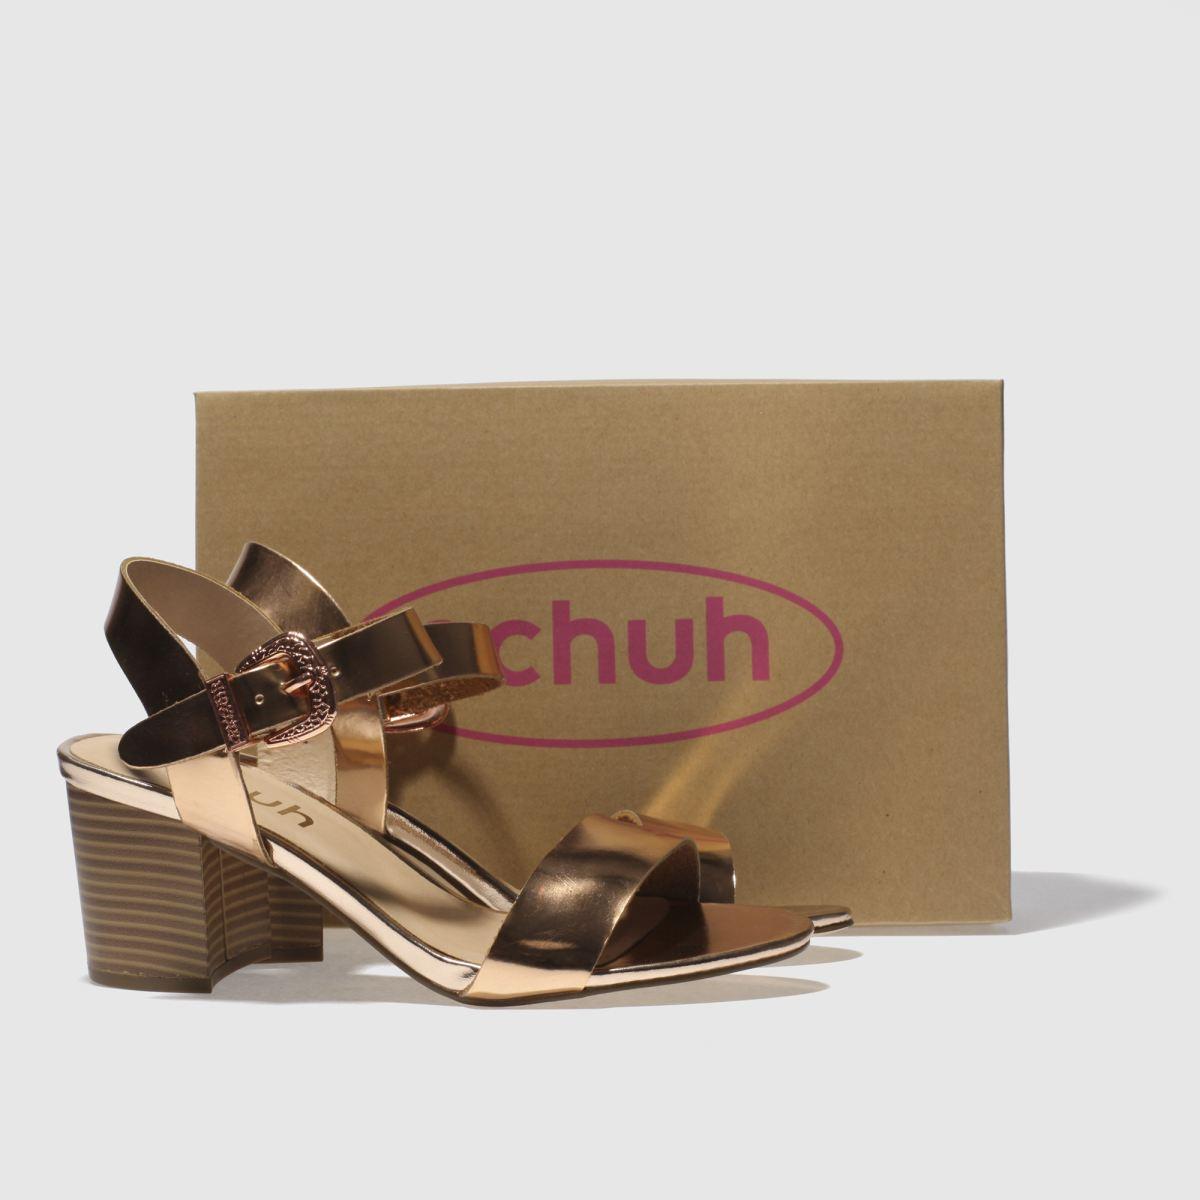 Damen Bronze Gute schuh Hotline Low Heels | schuh Gute Bronze Qualität beliebte Schuhe d3b52c